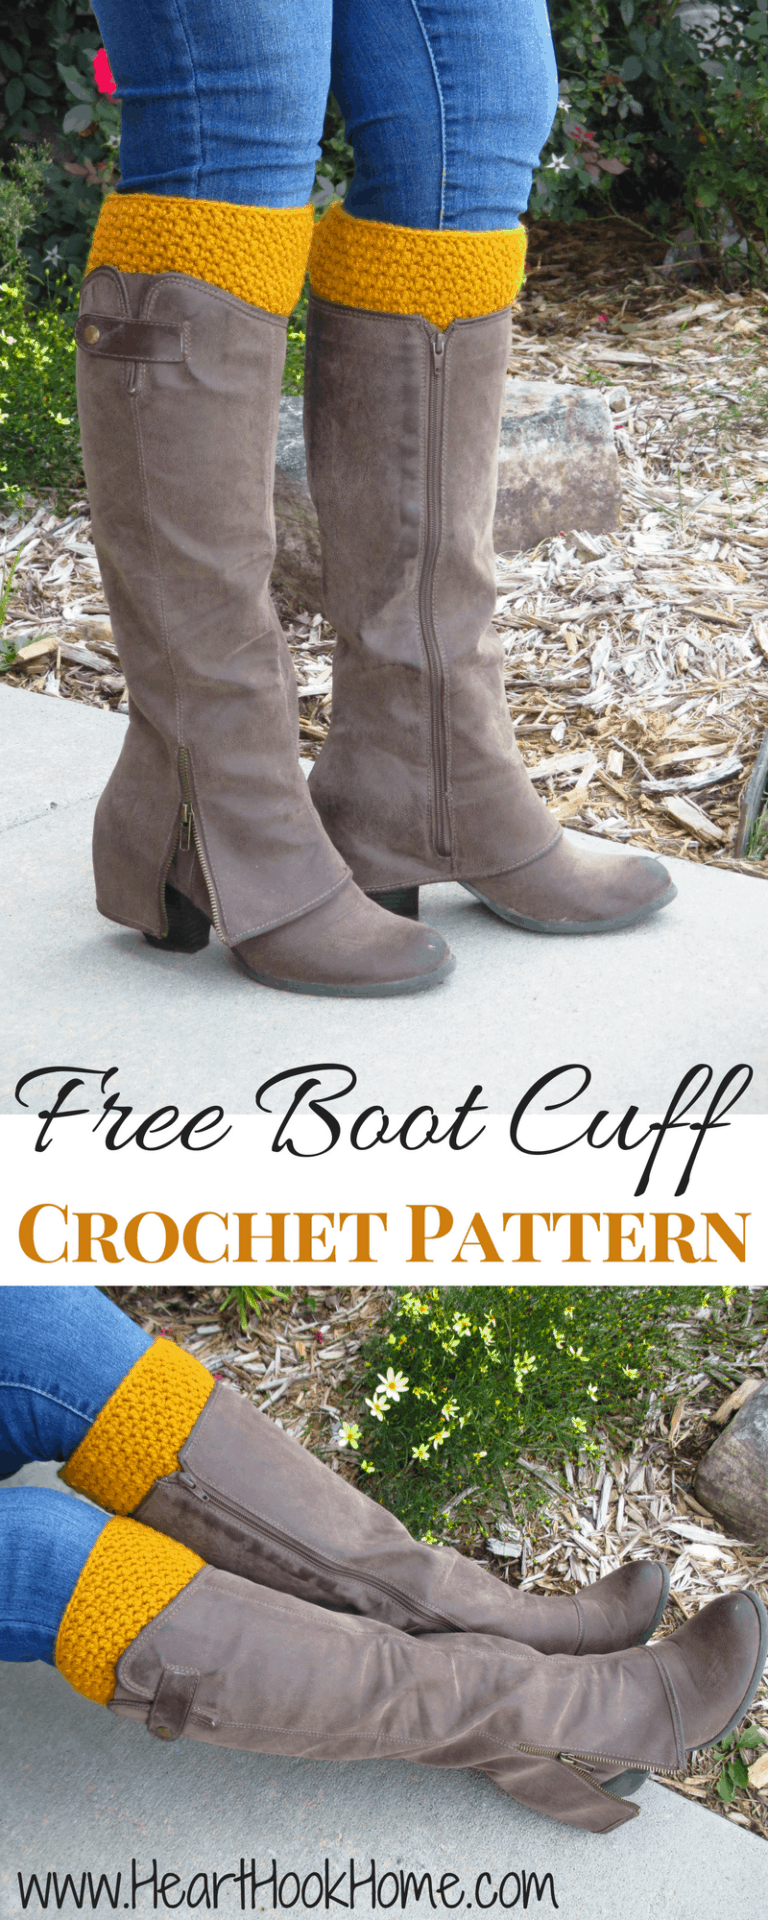 Reversible Boot Cuffs - Free Crochet Pattern